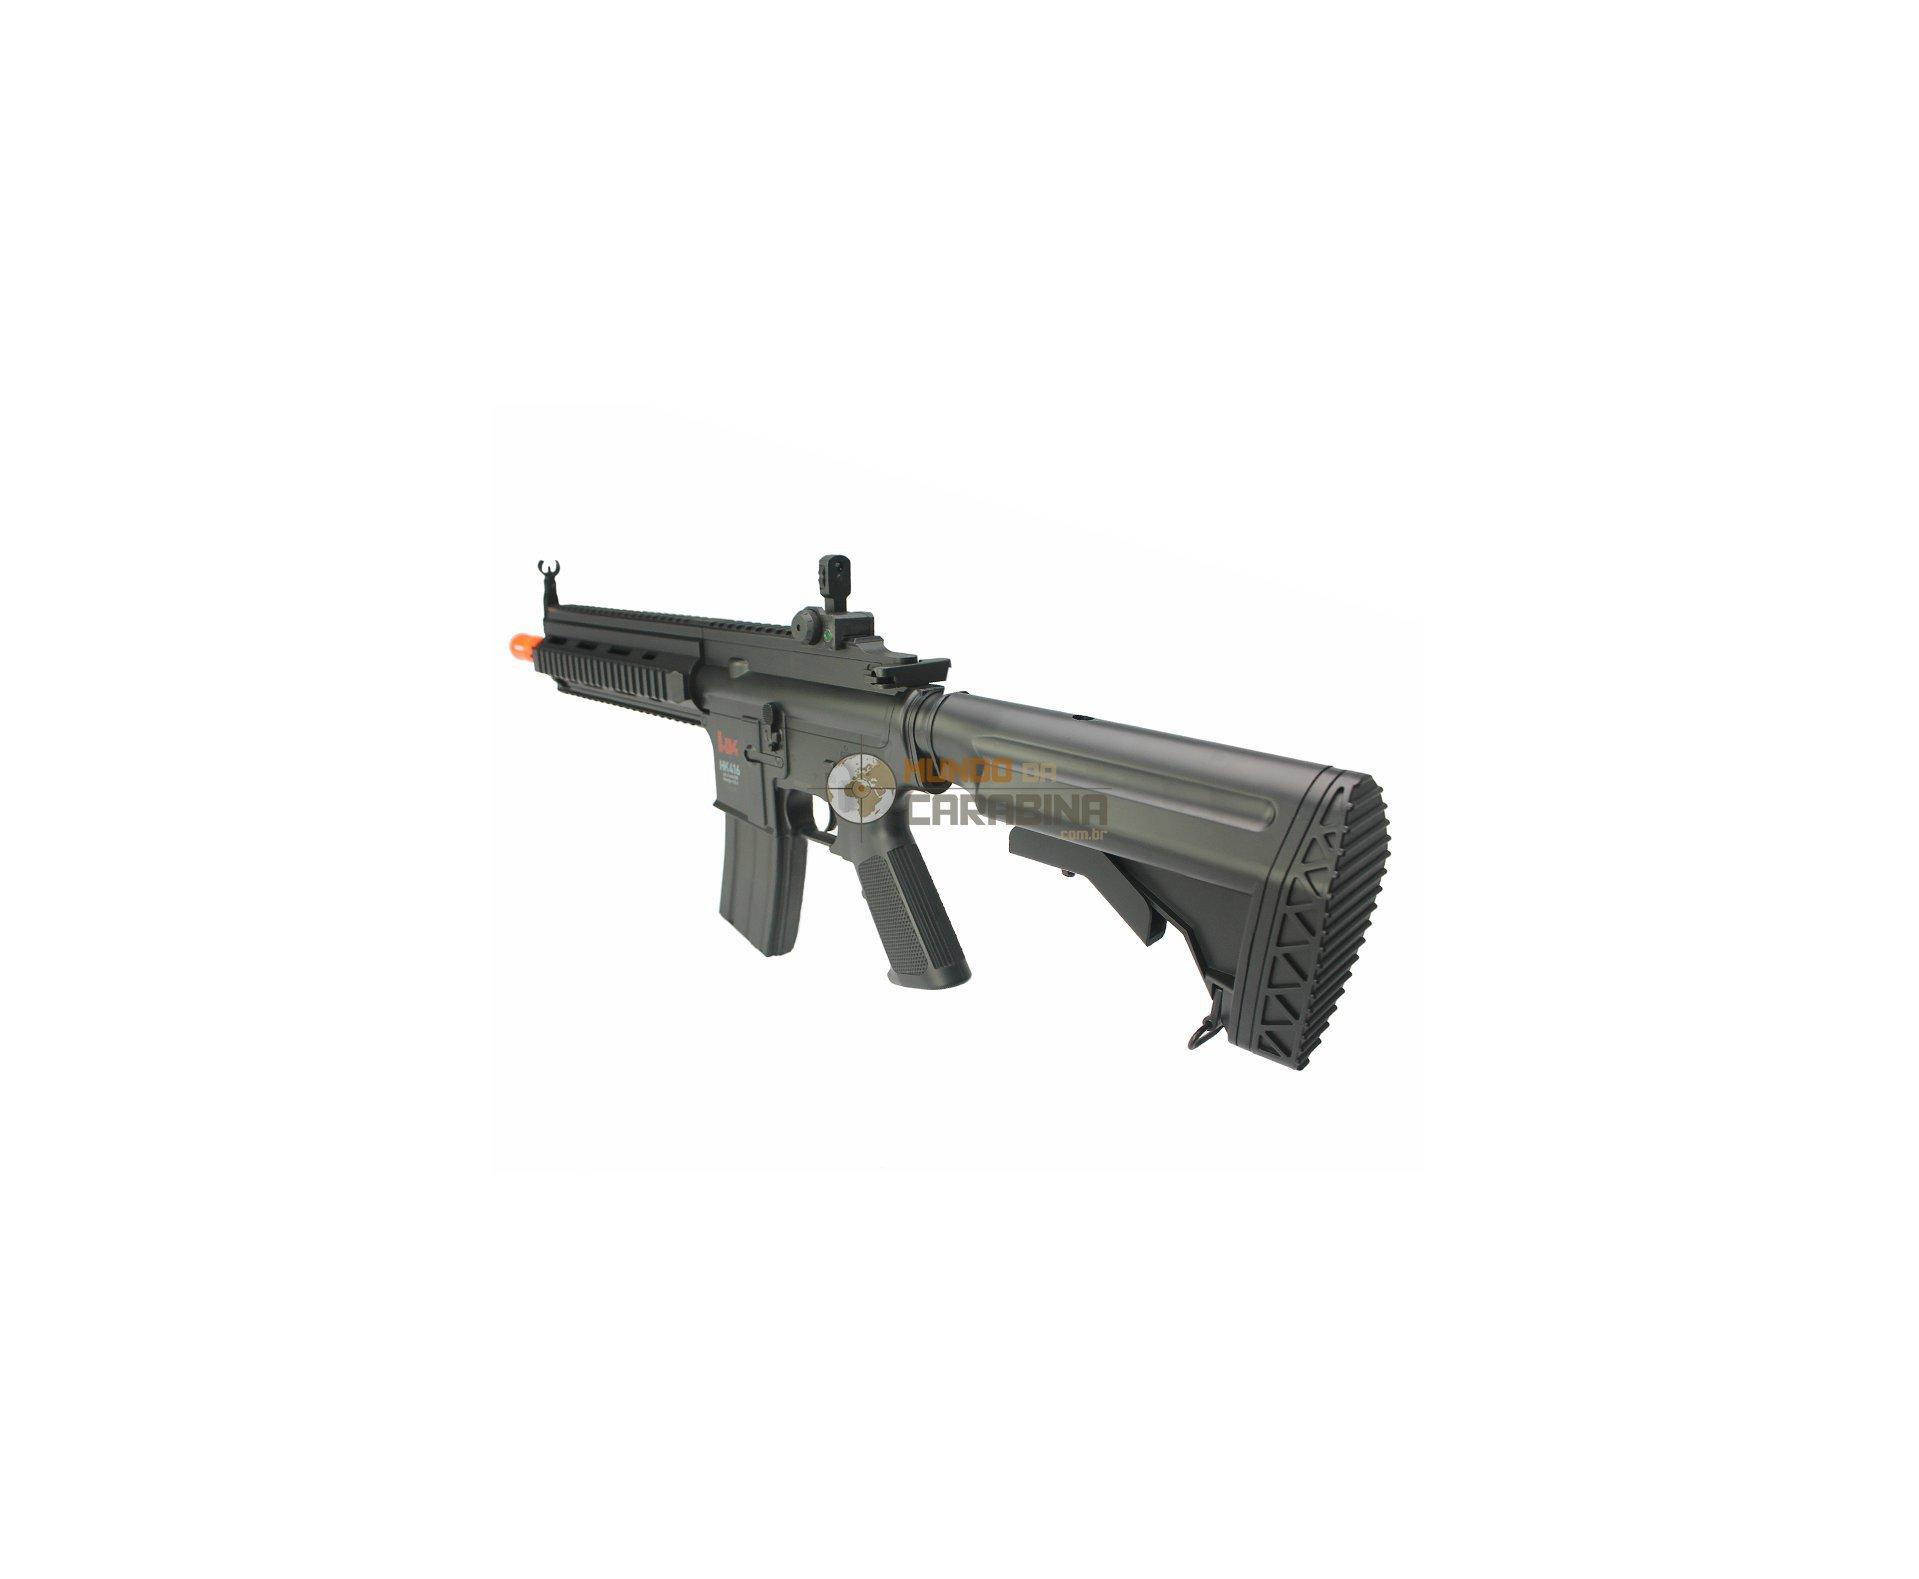 Rifle De Airsoft H&k Hk 416 Cqb Cal 6.0mm + Pistola 24/7 Co2 + Co2 + 4.000 Bbs 0,12g - Umarex